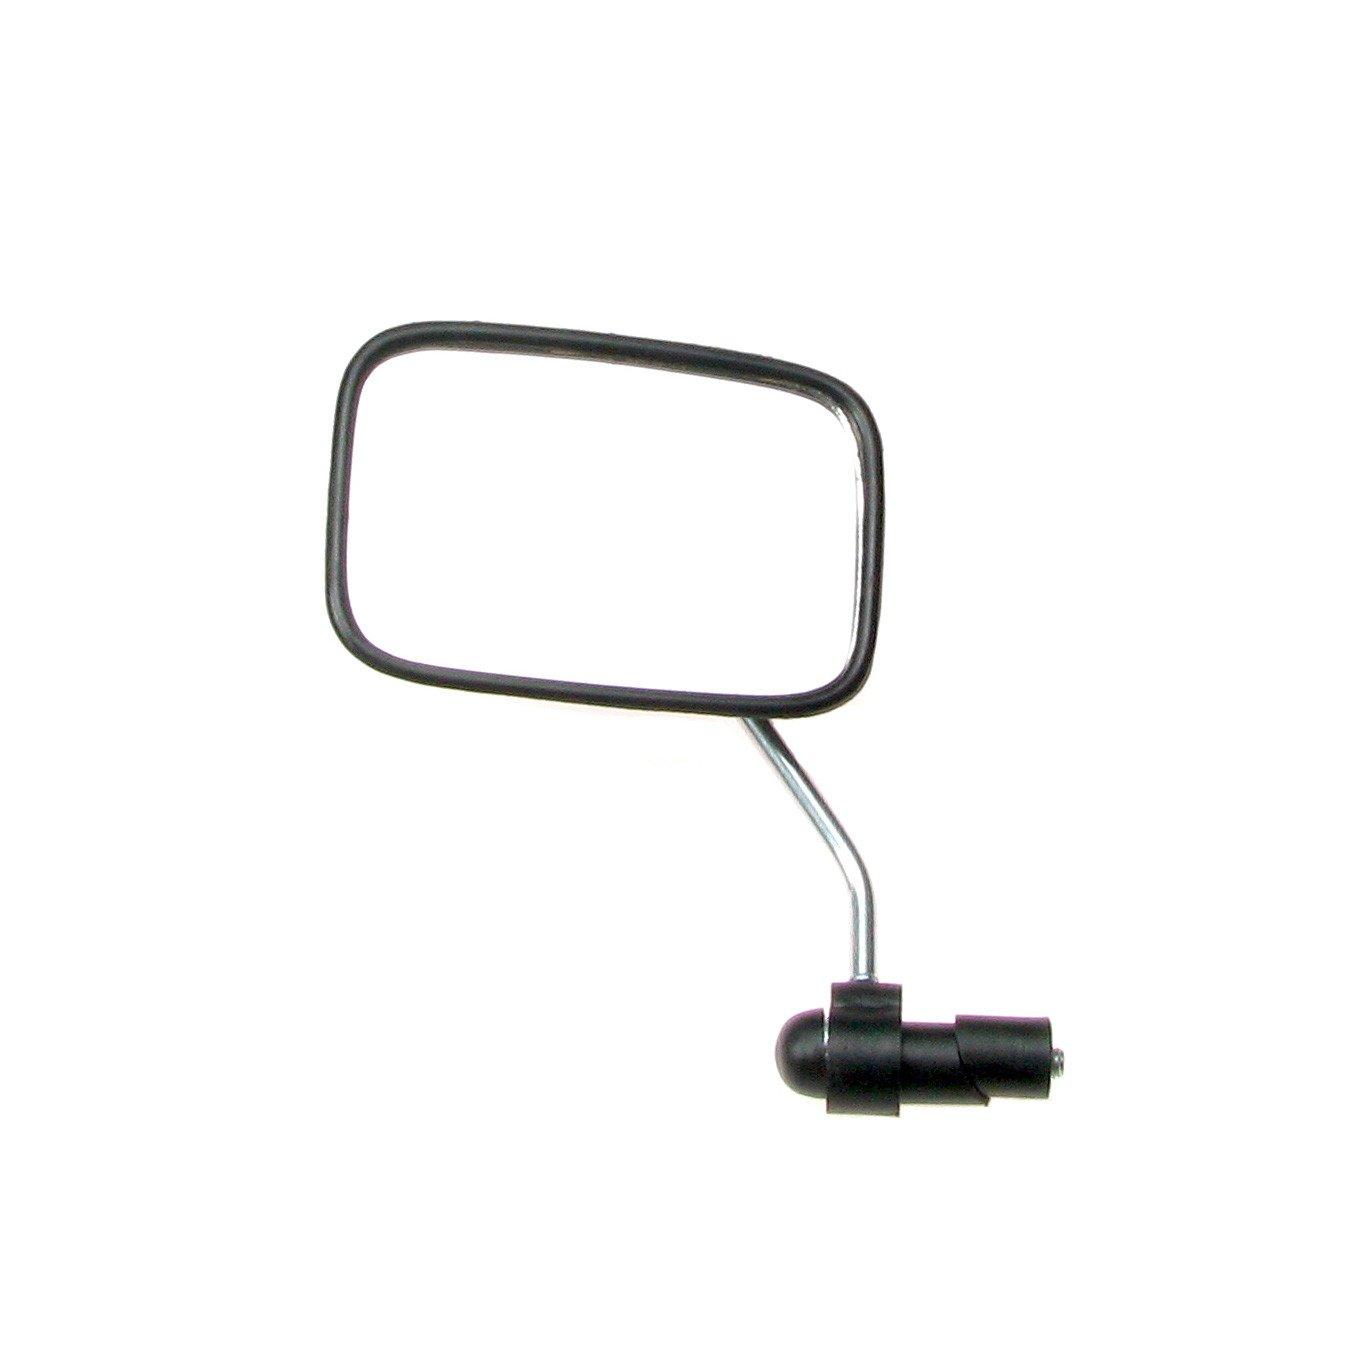 kurz Universal Spiegel M8 // Schelle eckig Form rechts//links für Moped Mofa